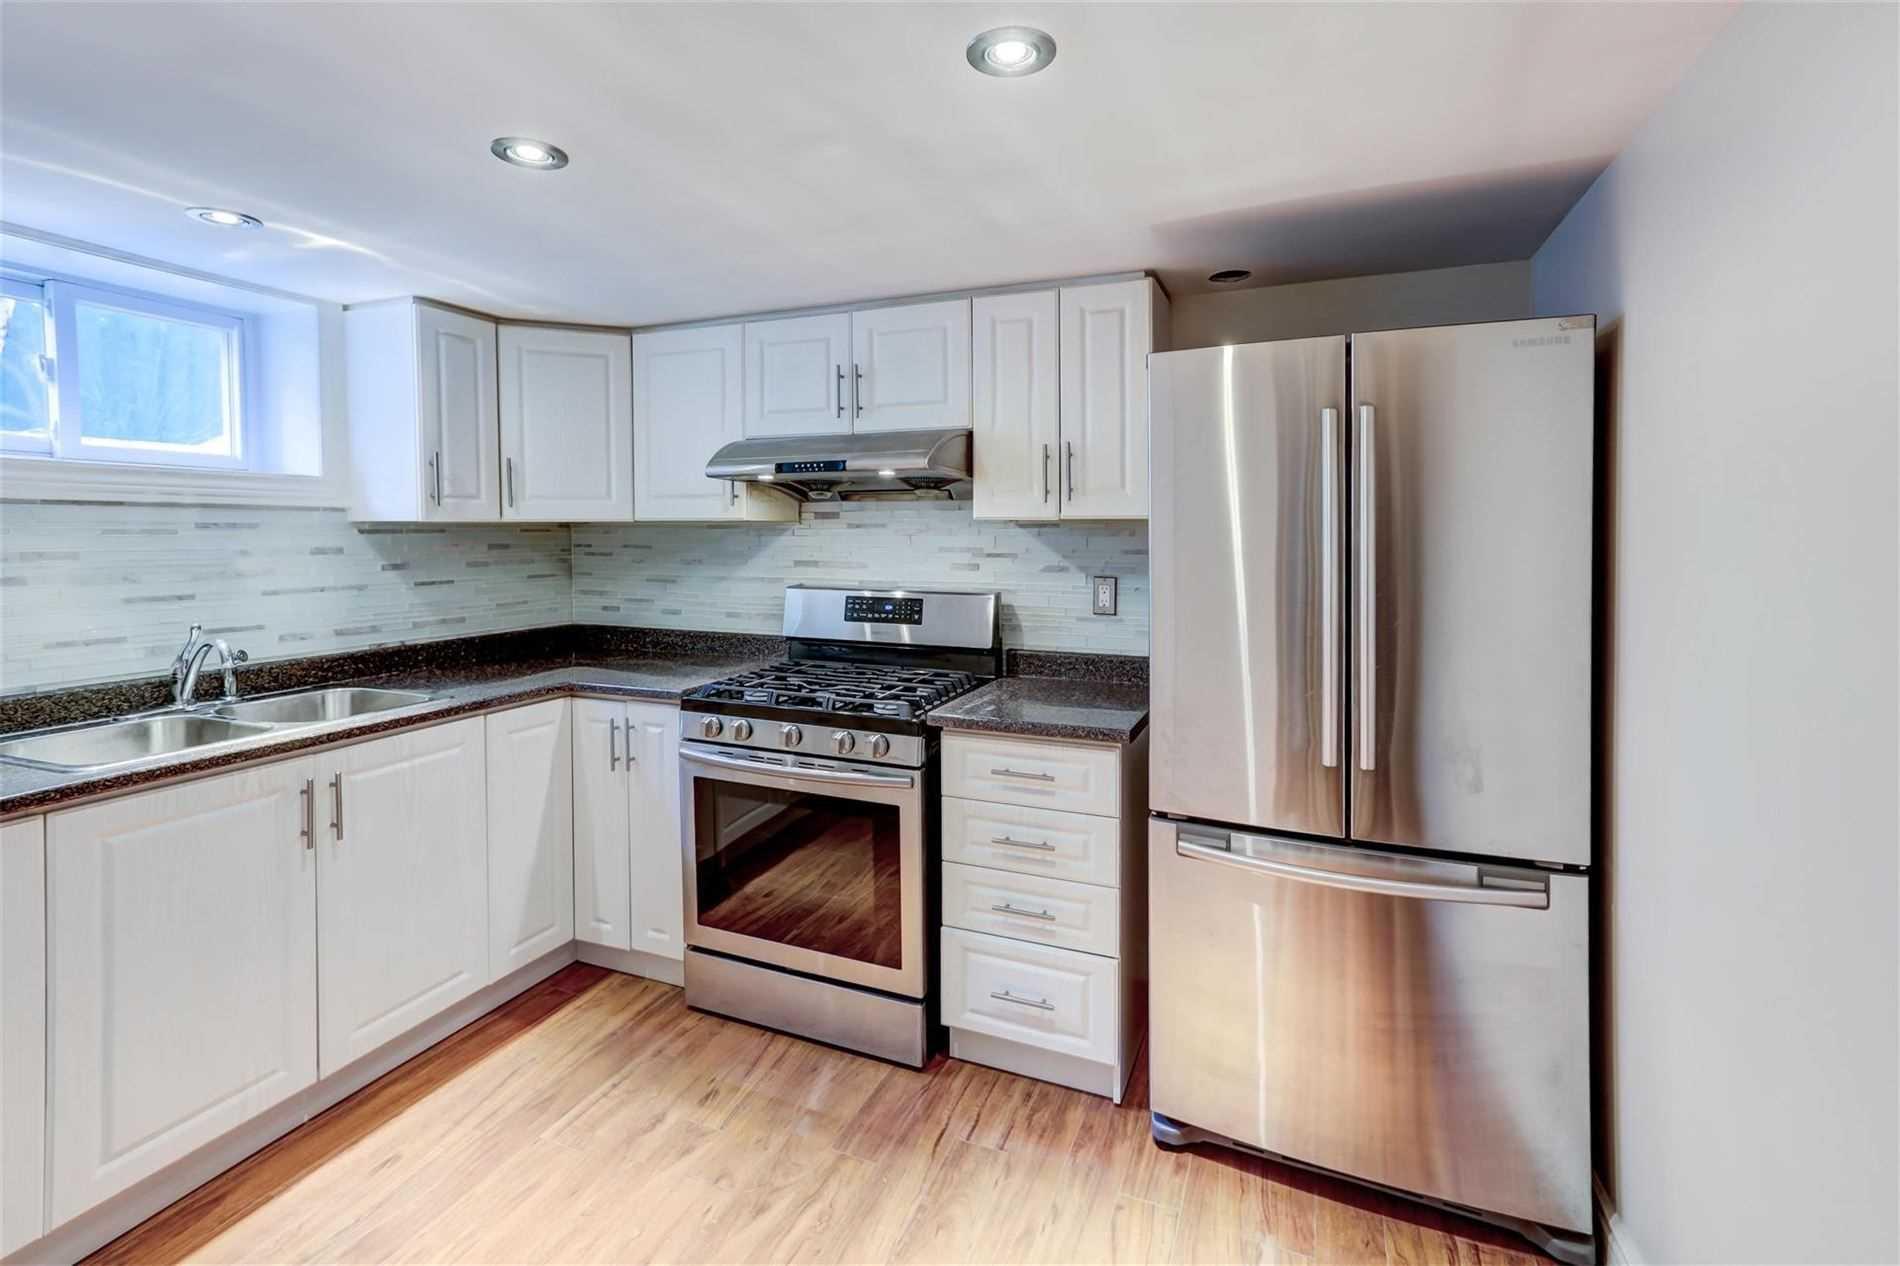 30 Jopling Ave N, Toronto, Ontario (ID W4683939)